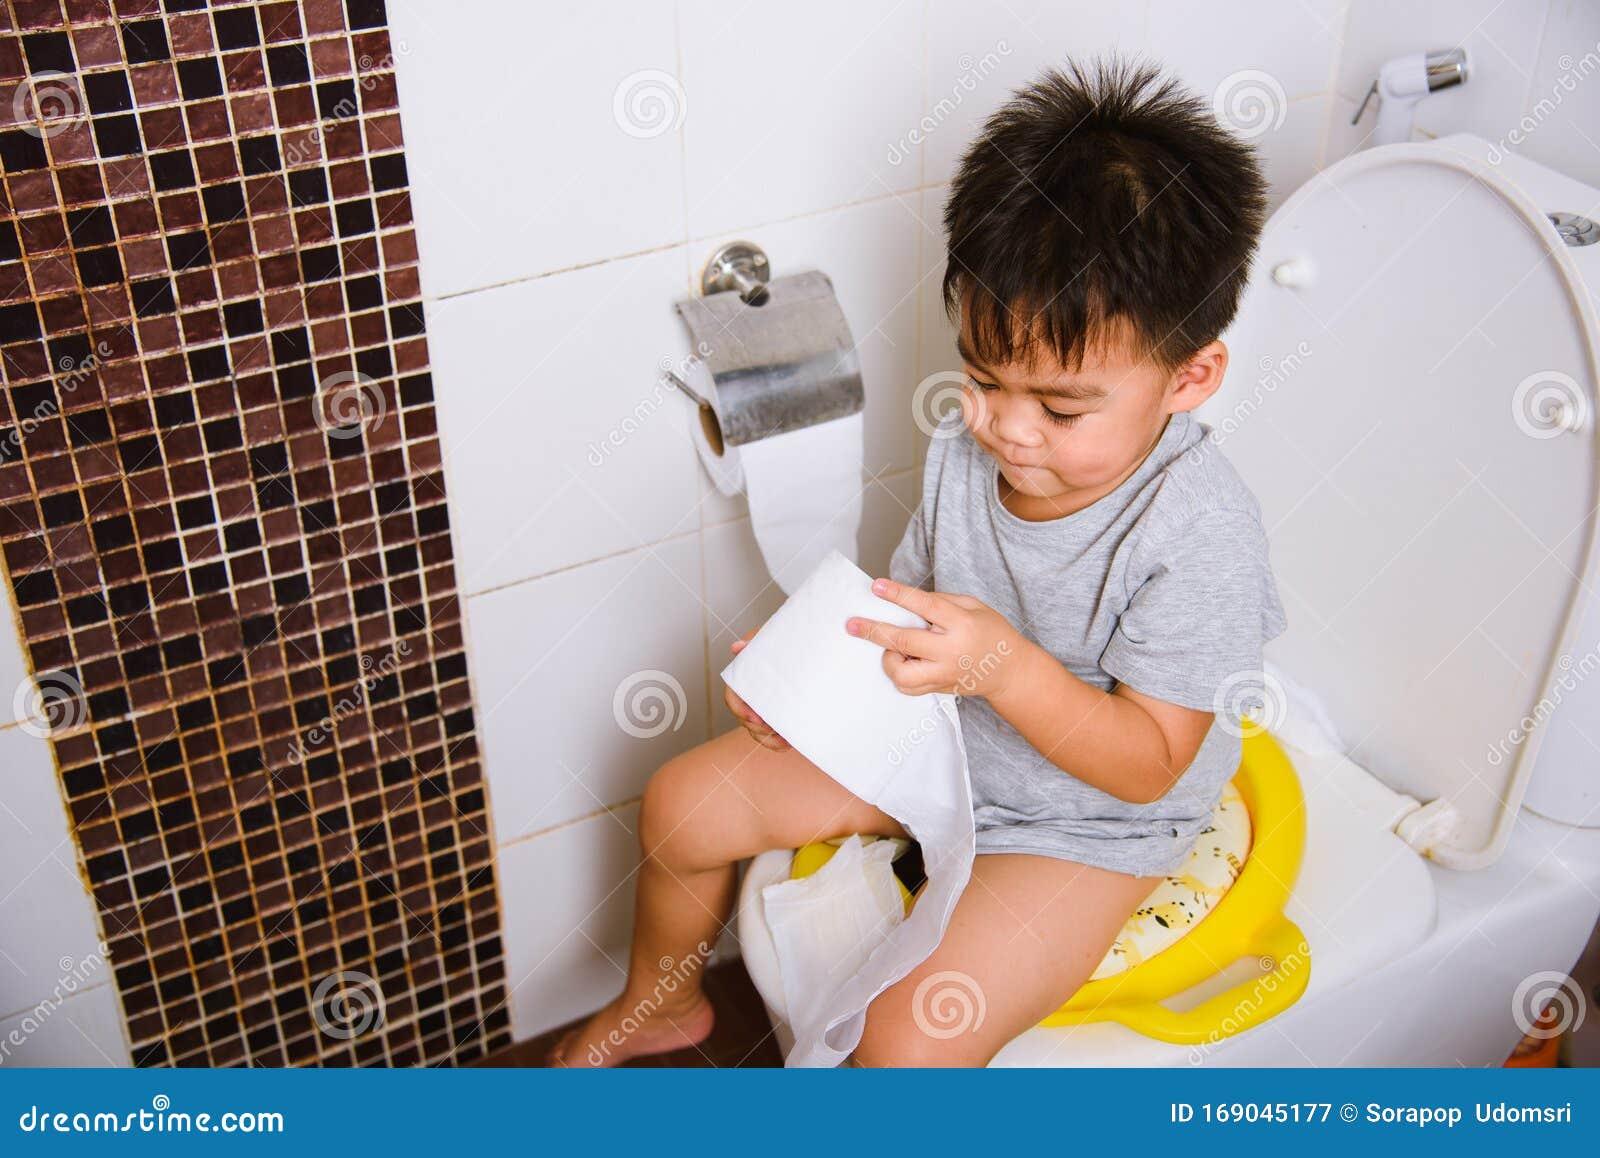 Asian Little Kid 2-3 Years Old Sitting On A Kid Bathroom